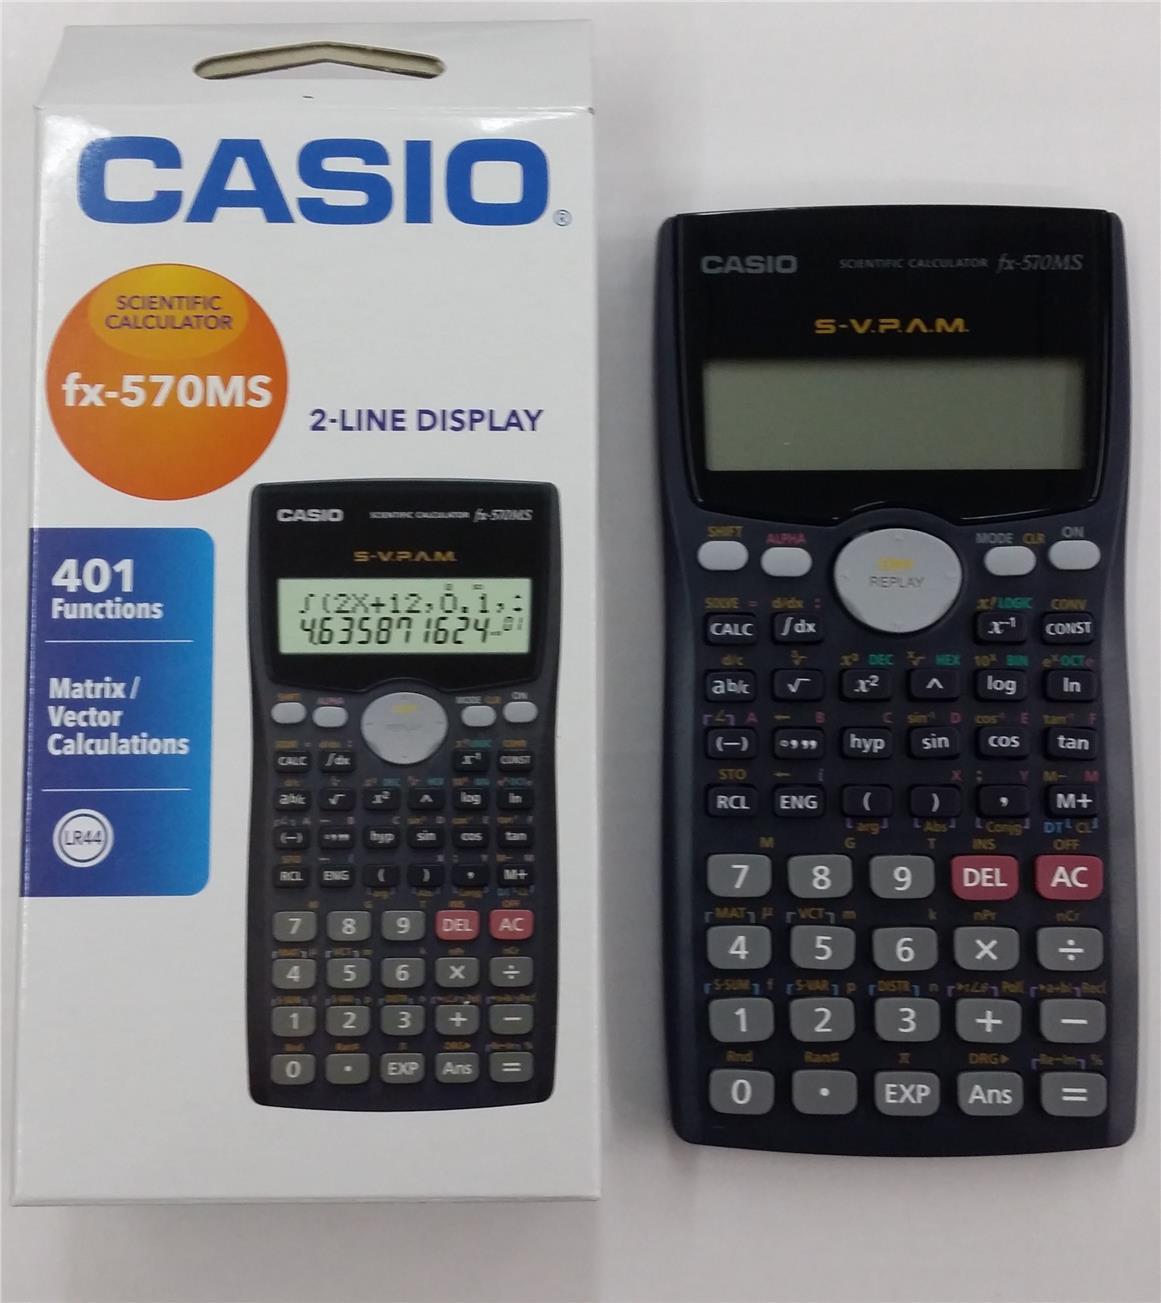 Casio Scientific Calculator Fx 570m End 9 2 2016 915 Pm 570ms Fx570ms Original